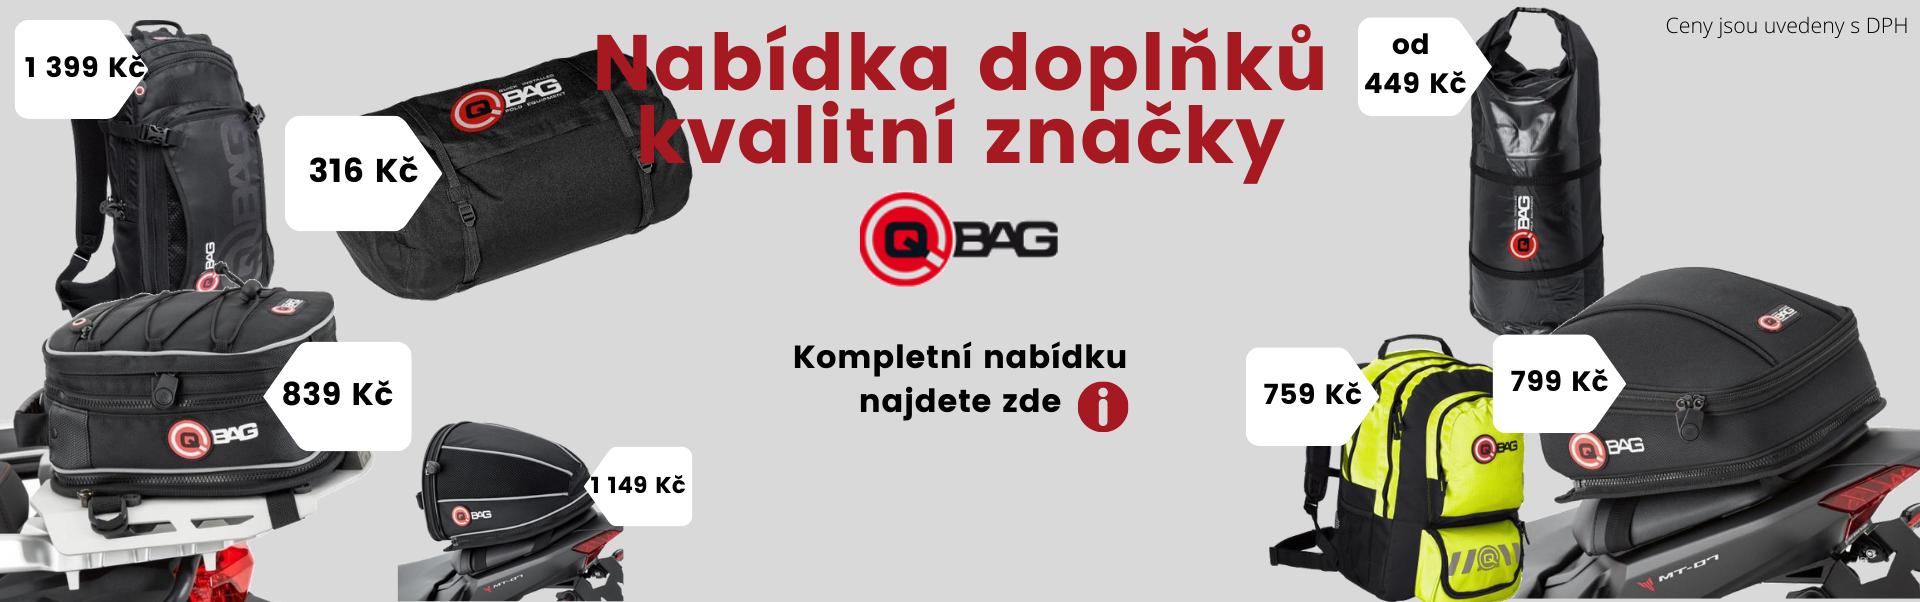 Doplňky QBag